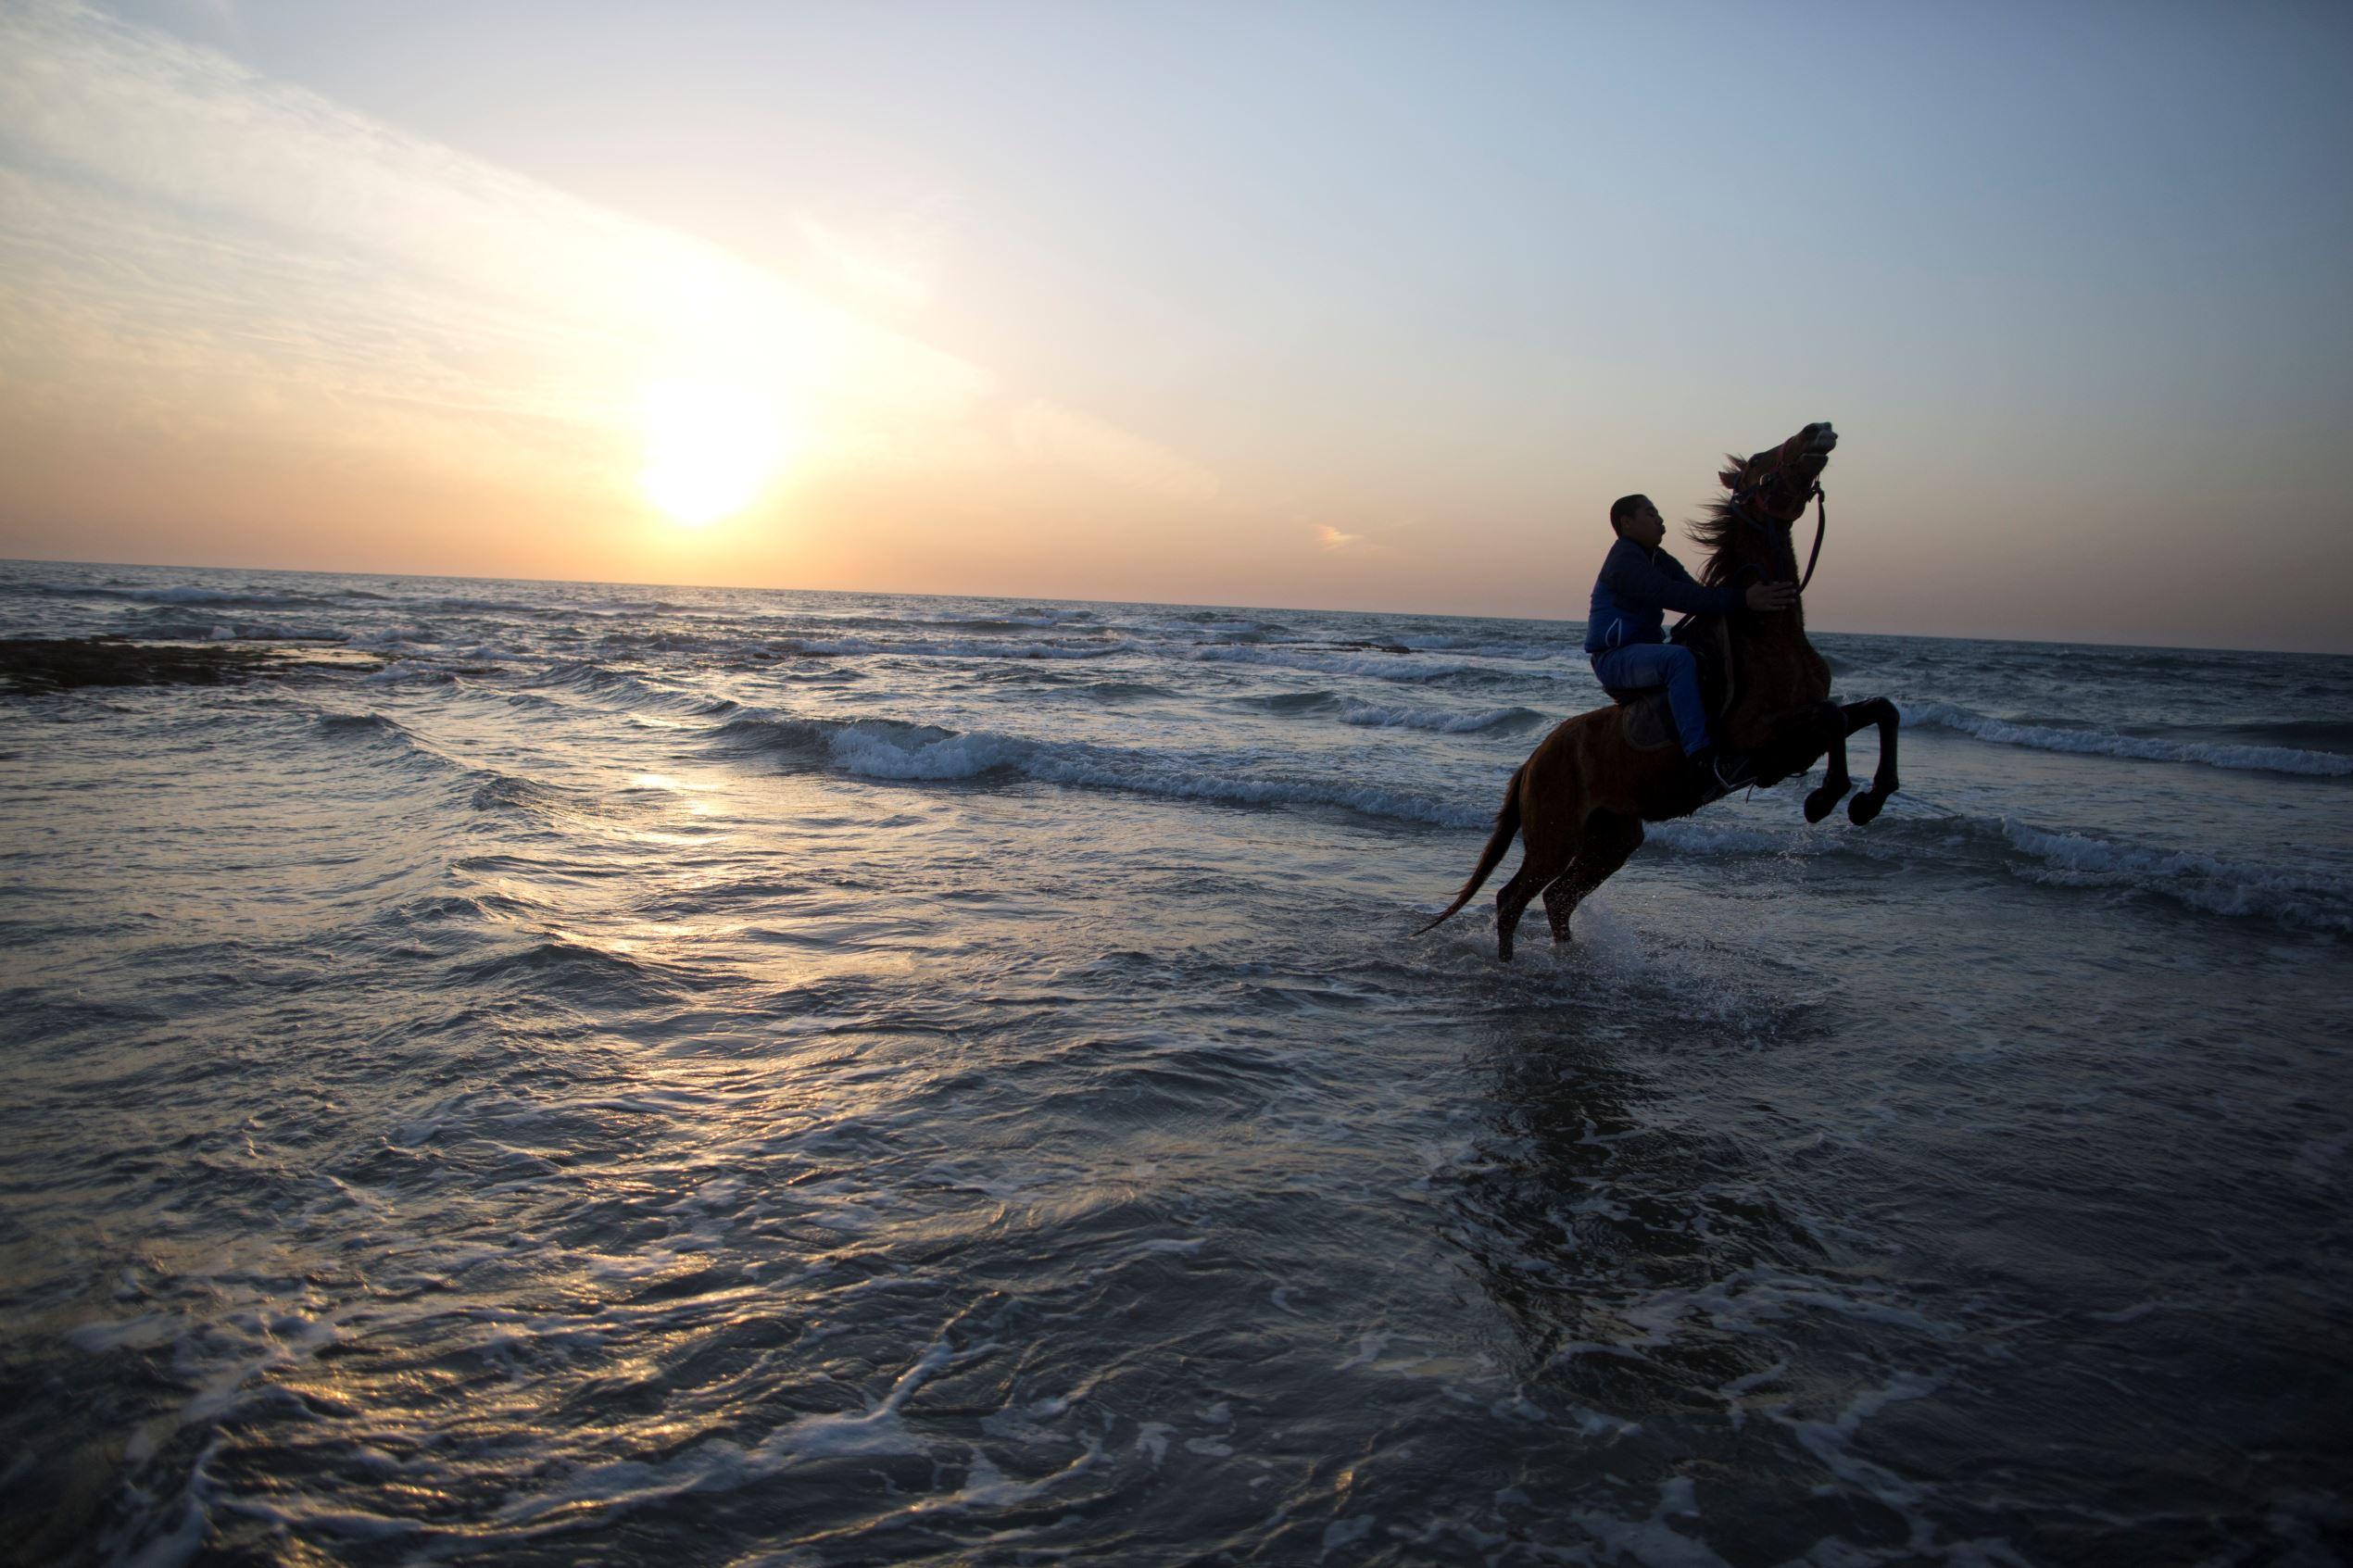 Слайд 39 из 67: JISR AZ ZARQA, ISRAEL - MARCH 07:  An Arab Israeli man rides a horse on the beach  on March 7, 2016 in the Arab Israeli Town of Jisr az Zarqa, Israel.  Jisr az-Zarqa is the only remaining Arab town in Israel located on the coast of the Mediterranean Sea,